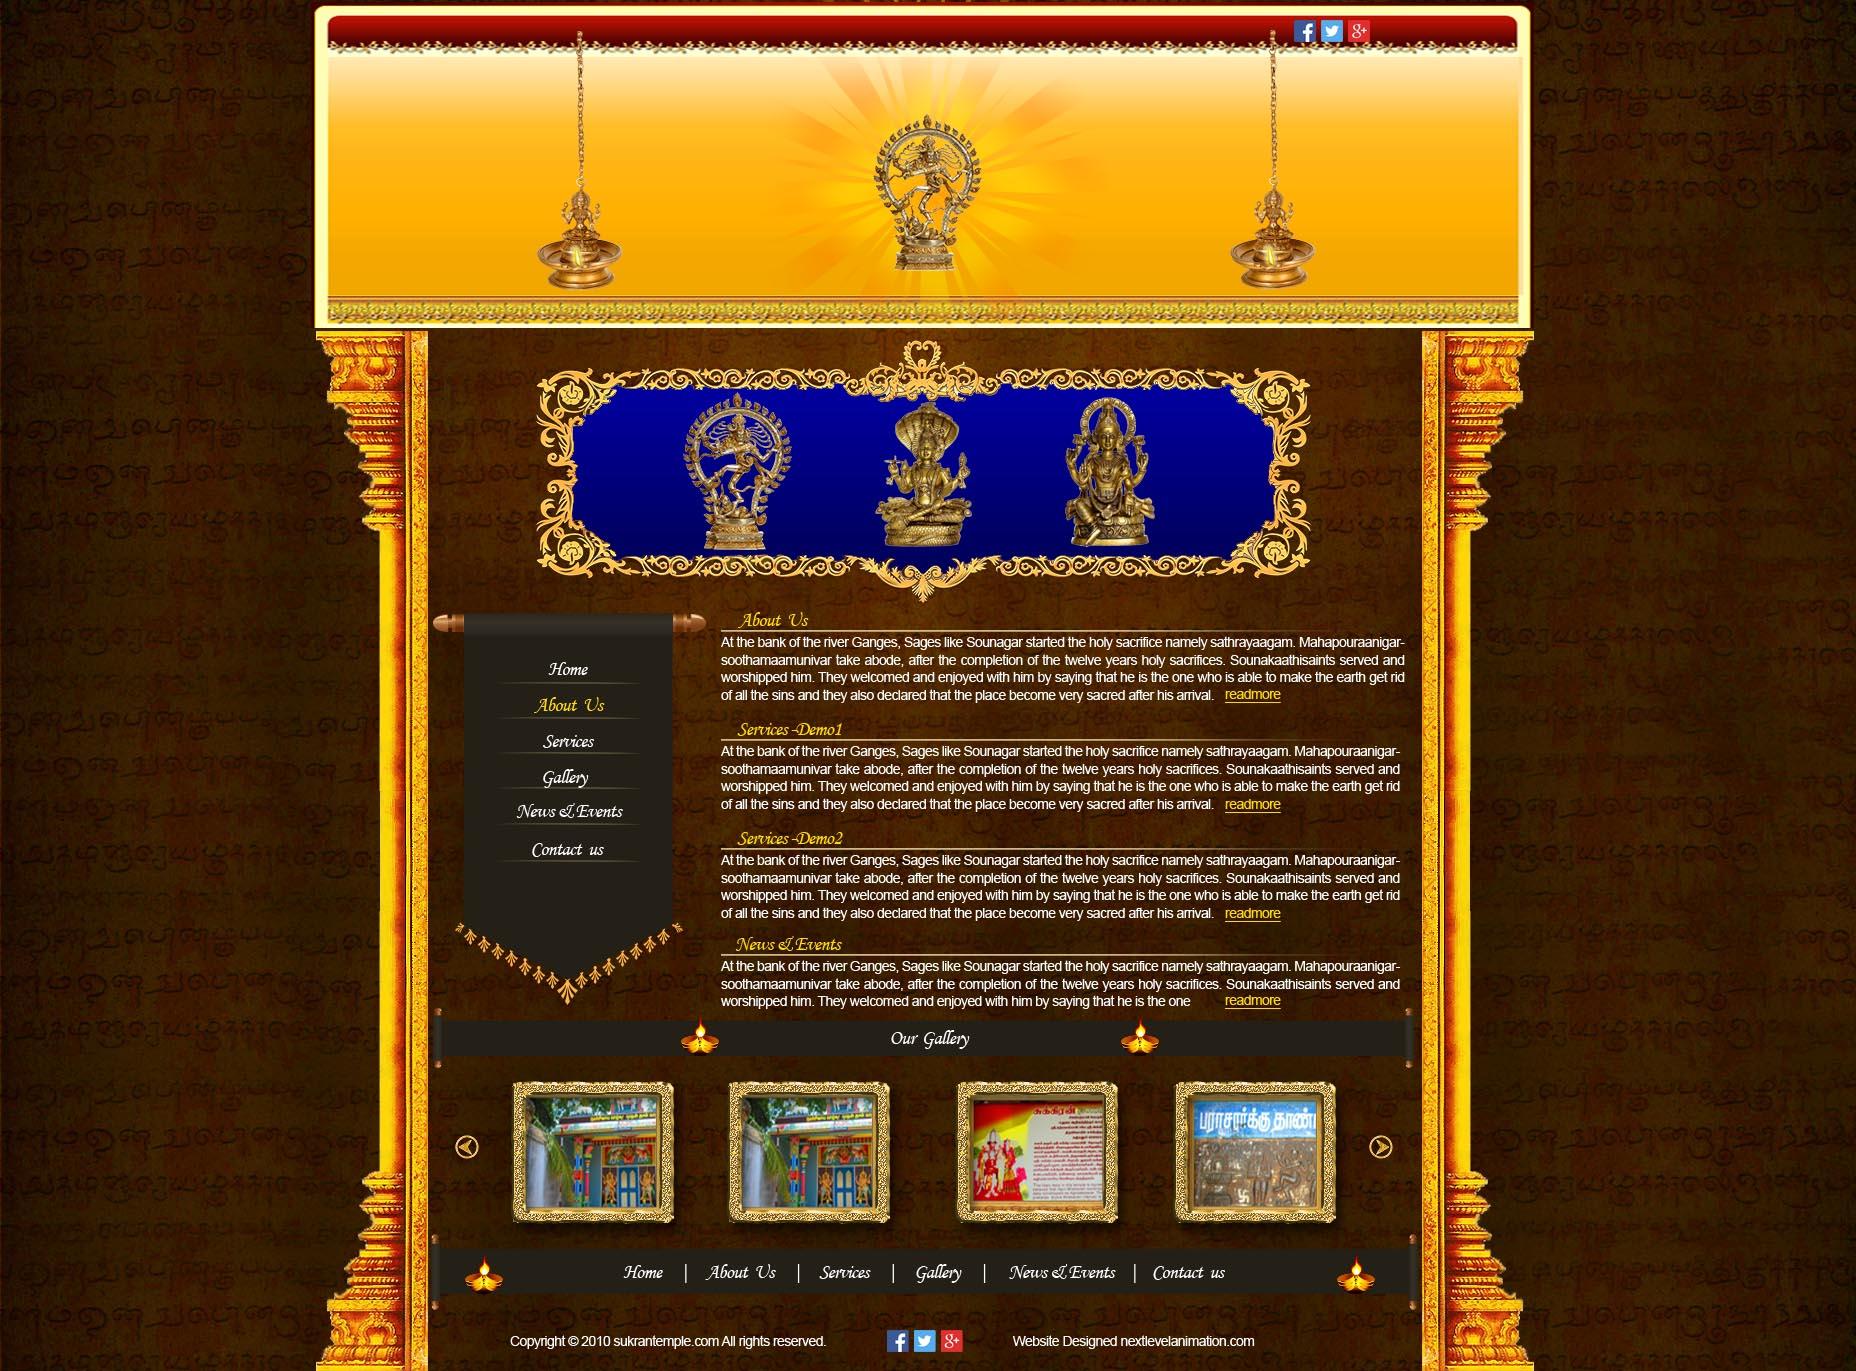 lord shiva temple website in Madurai